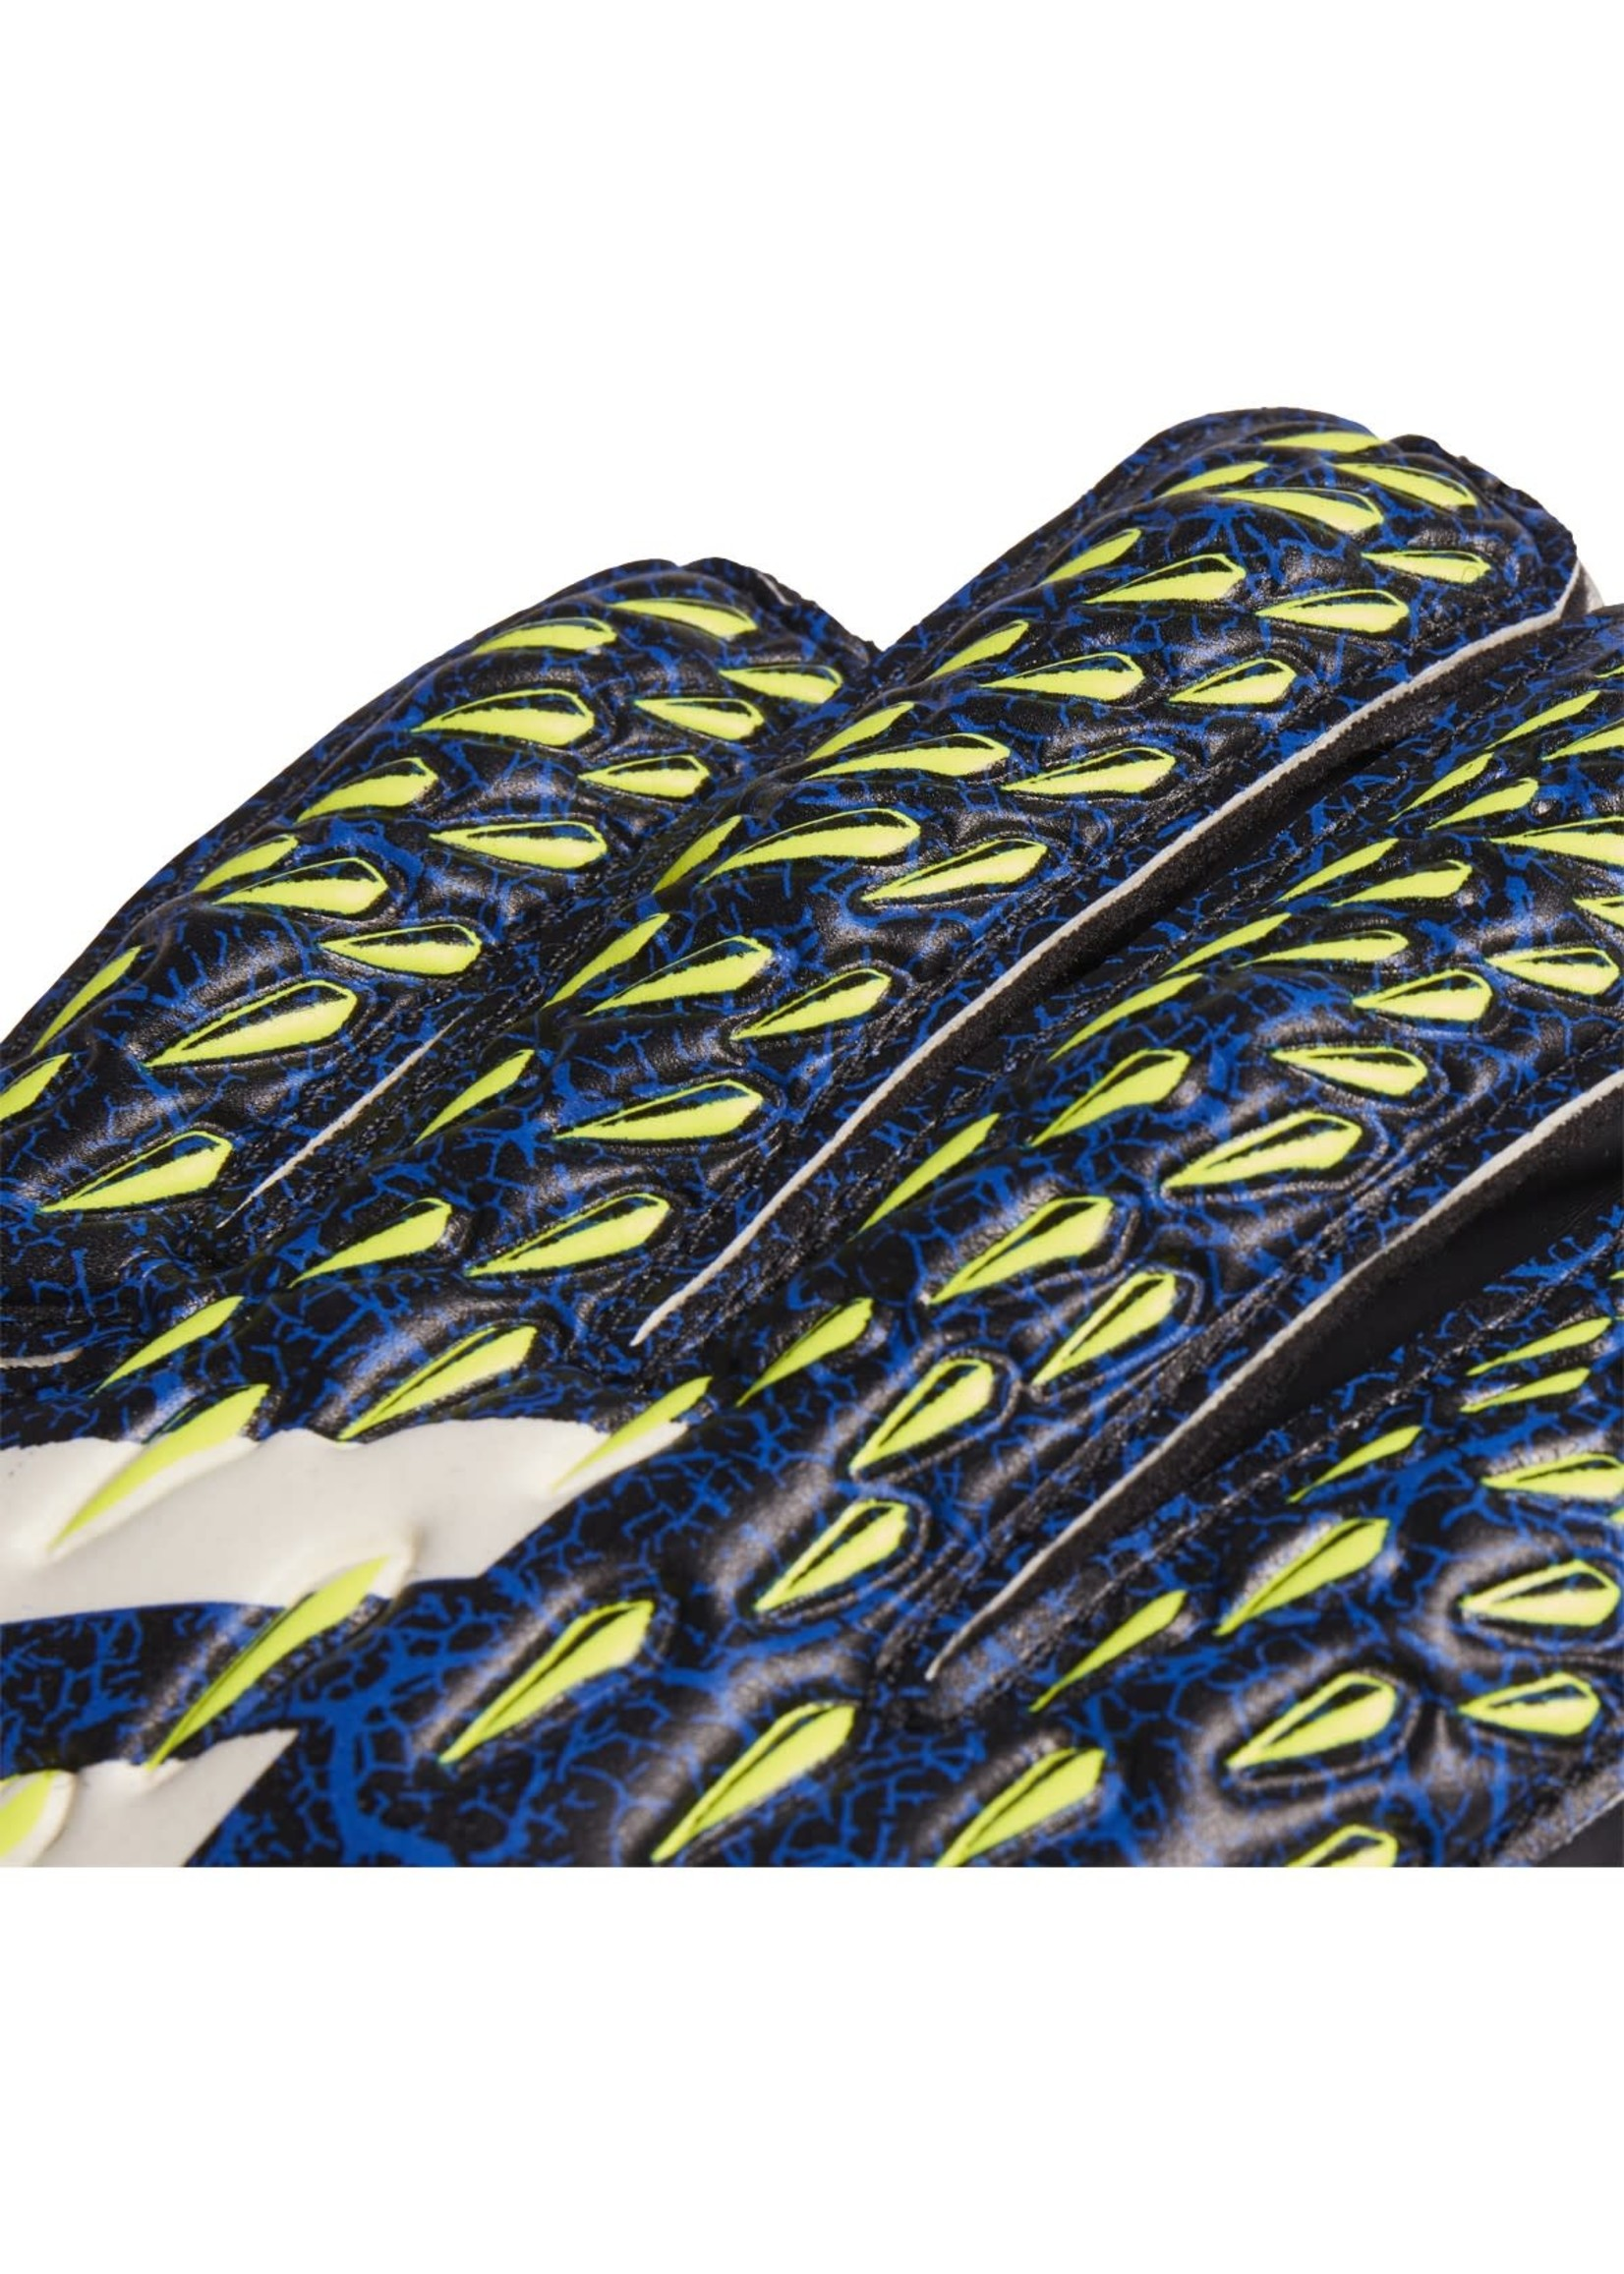 Adidas PREDATOR GL MATCH FS J